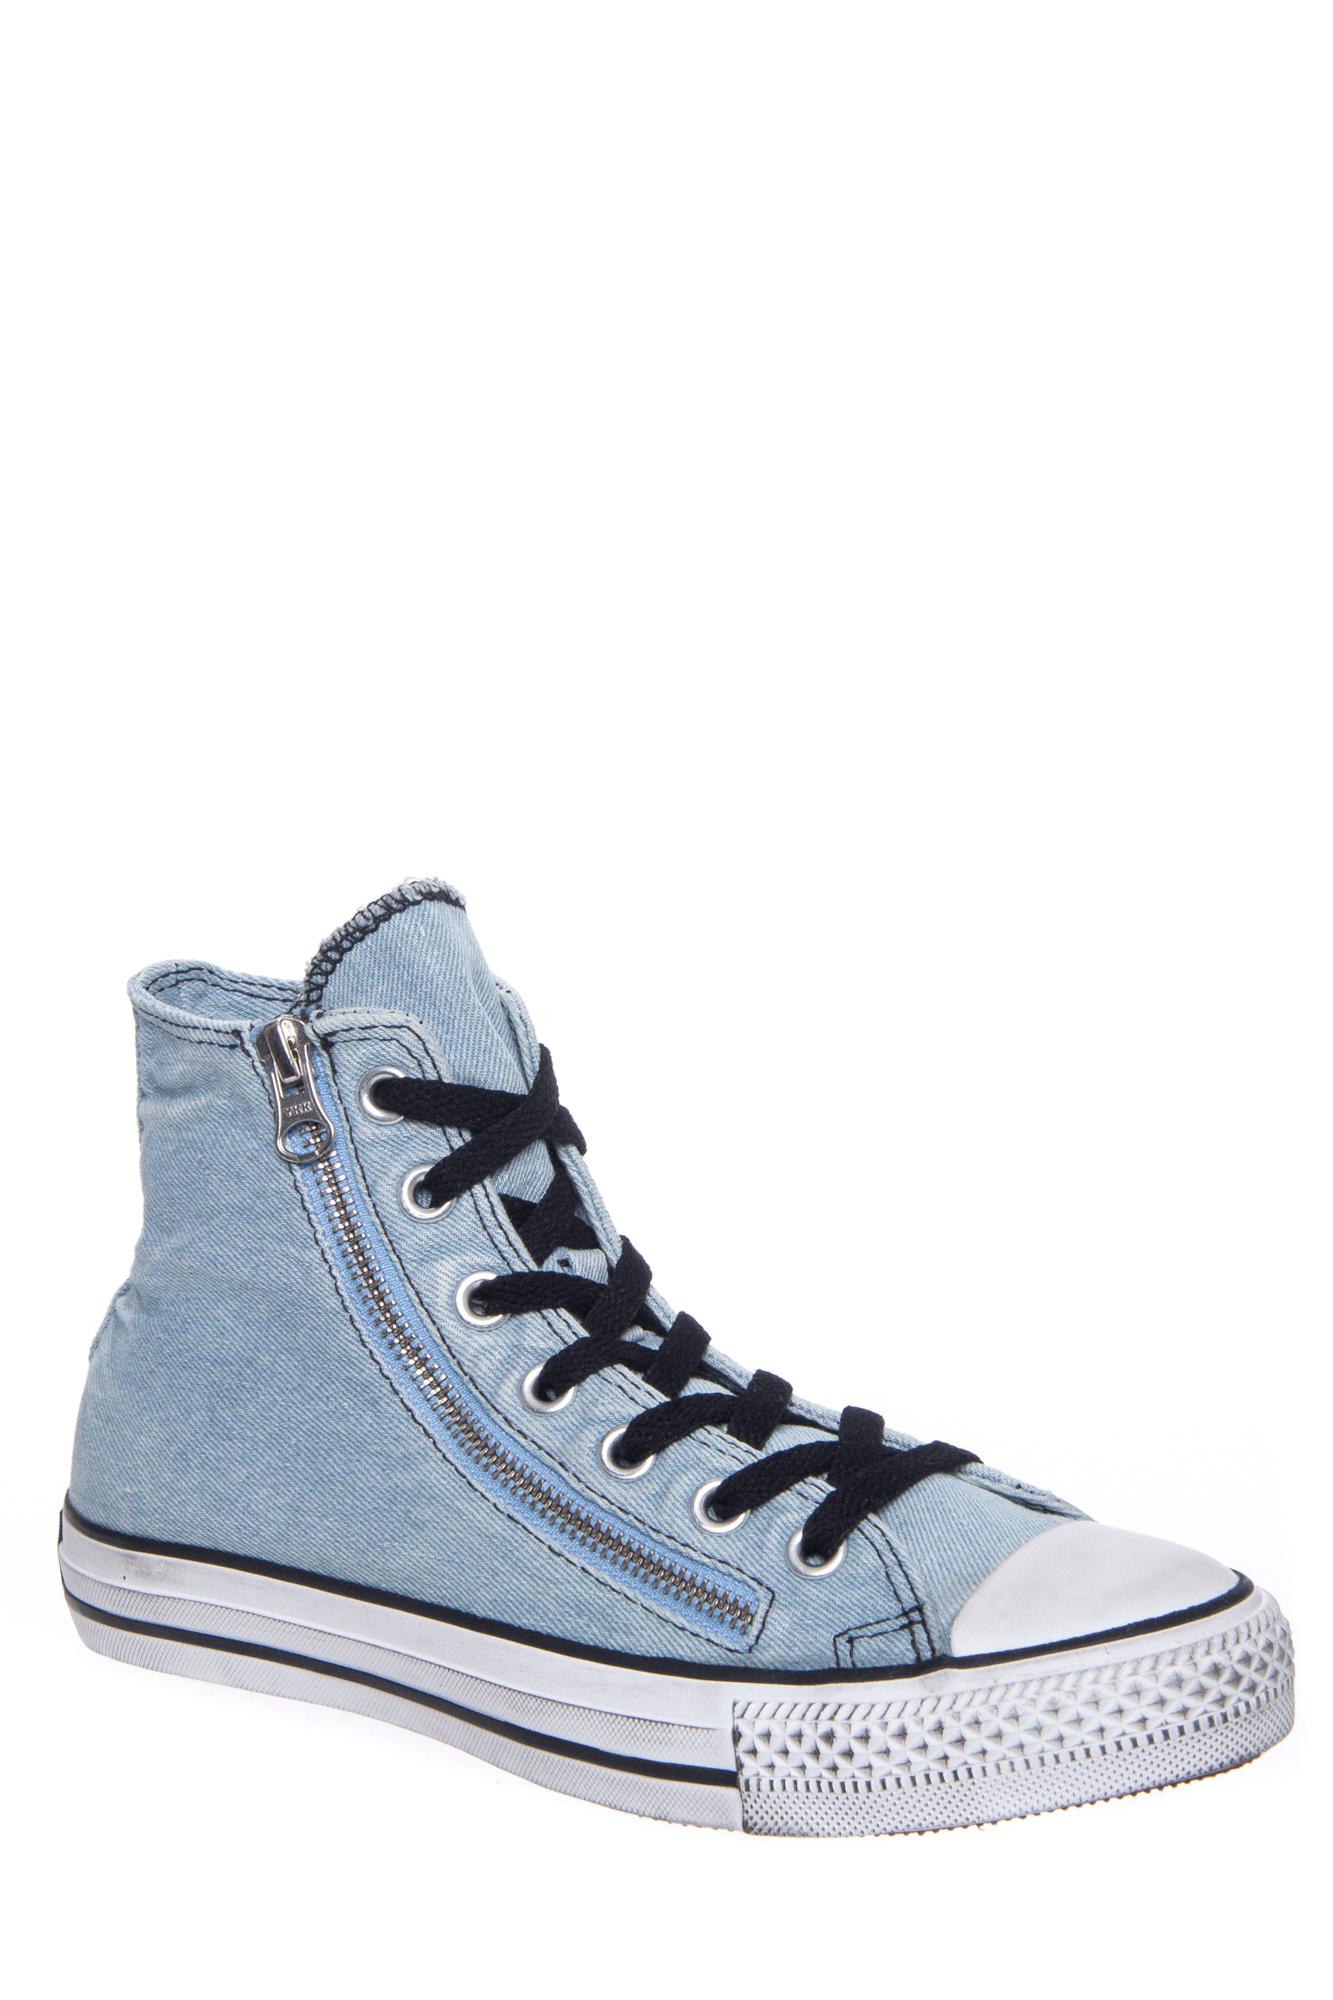 627fadd99619 Denim Double Zip UPC 886954515339 product image for Converse Unisex Chuck  Taylor Double Zip Hi Top Sneaker - Light ...